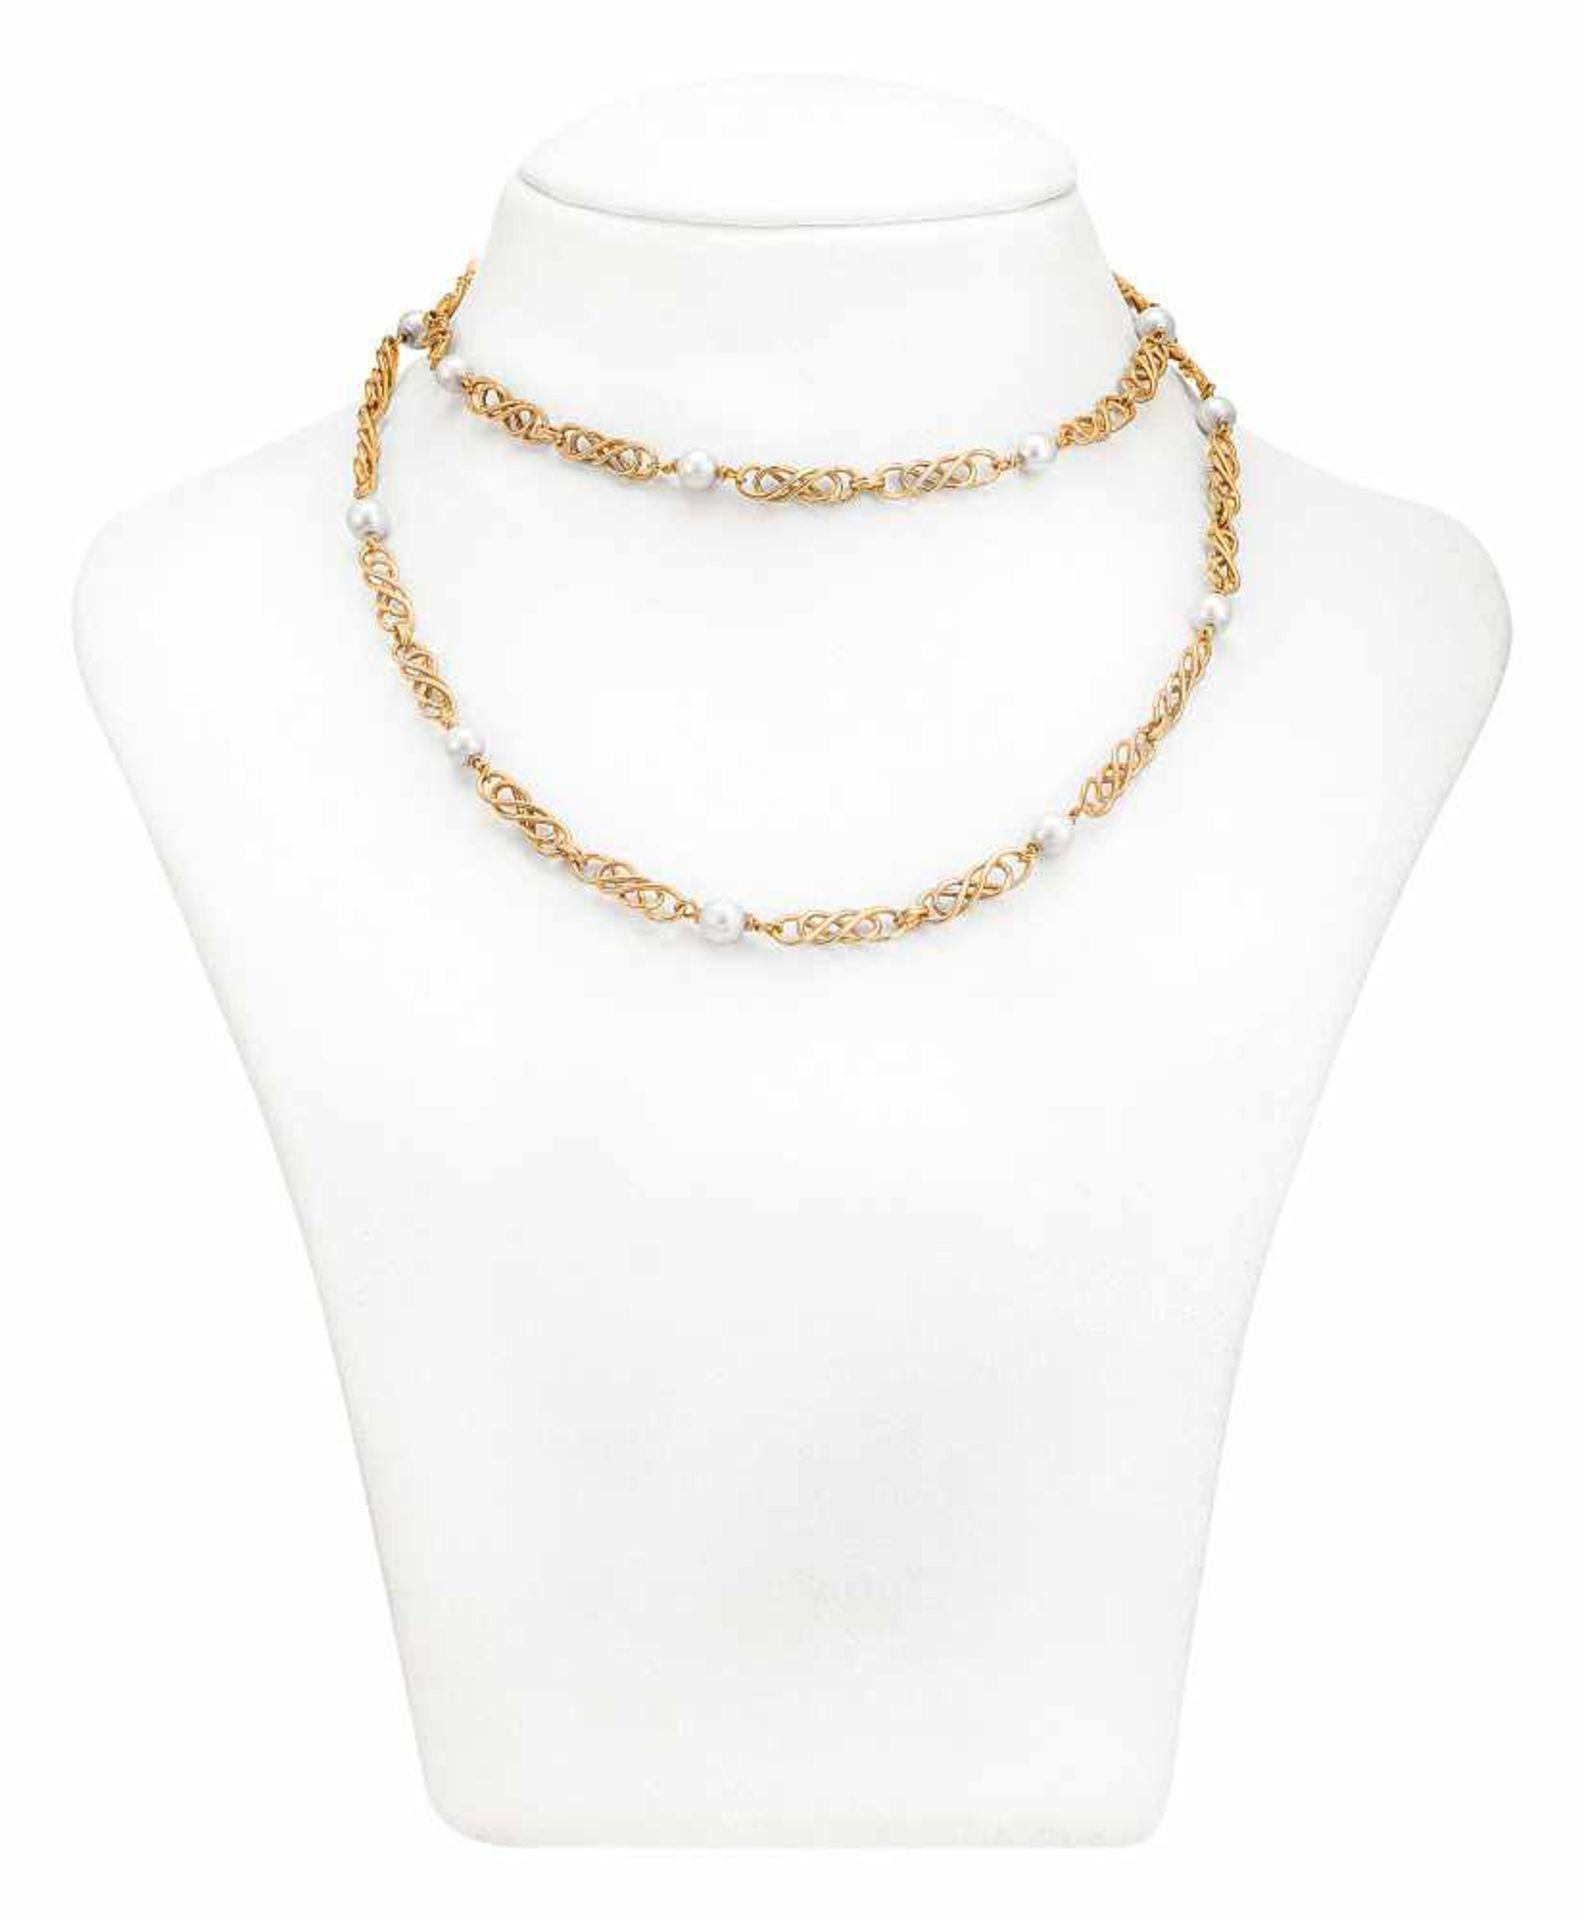 Art Déco Goldkette mit Perlen